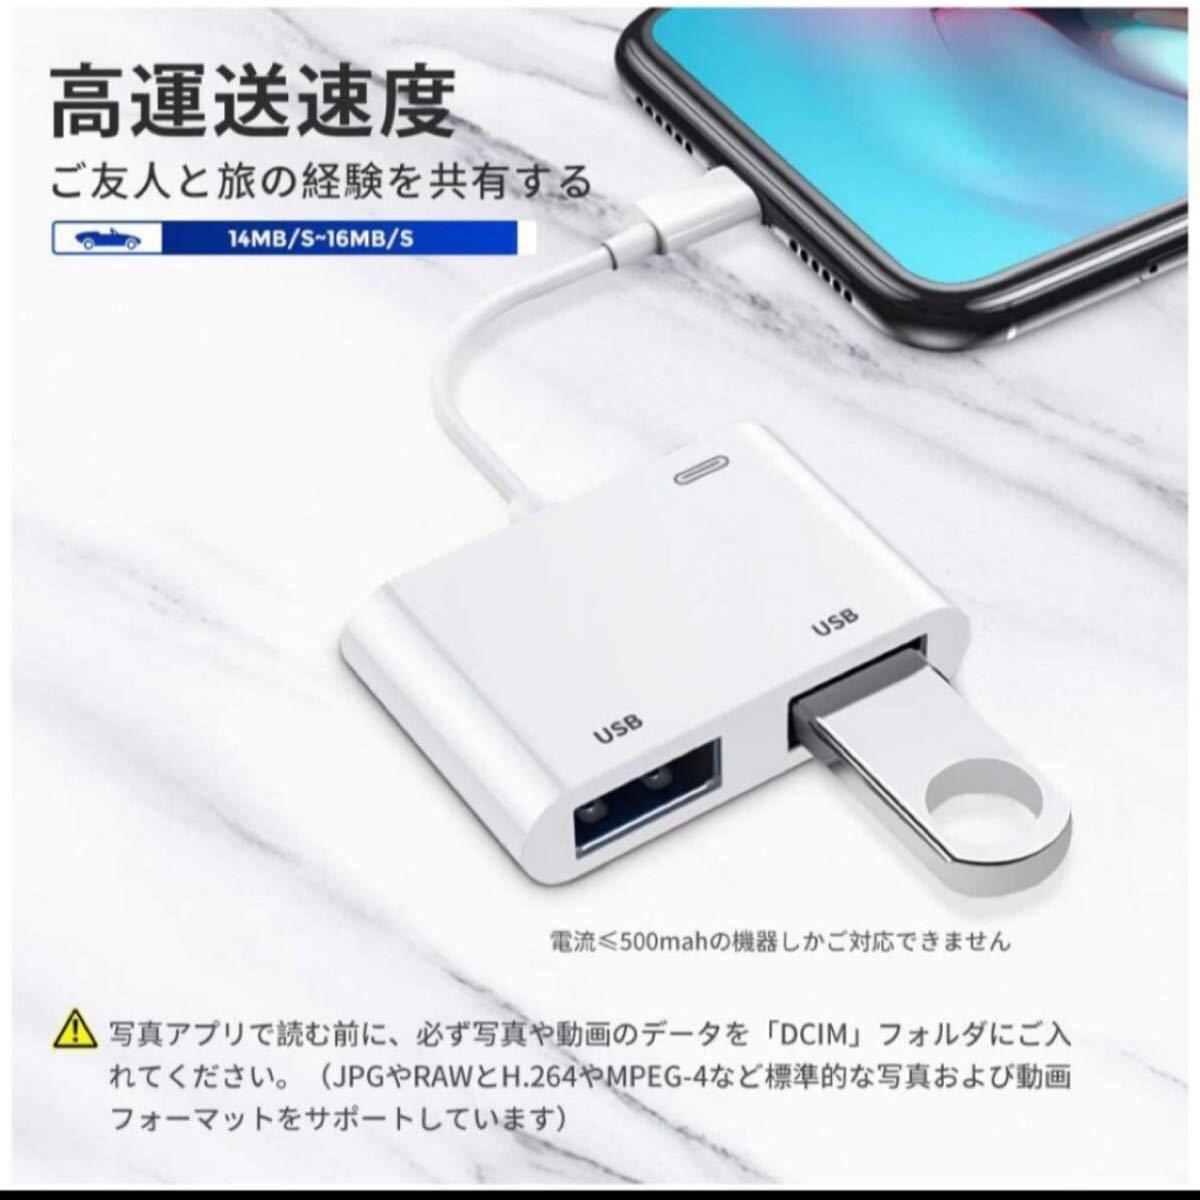 USB カメラ アダプタ iPhone/iPad専用 3in1ライトニング USBカメラ 変換アダプタ